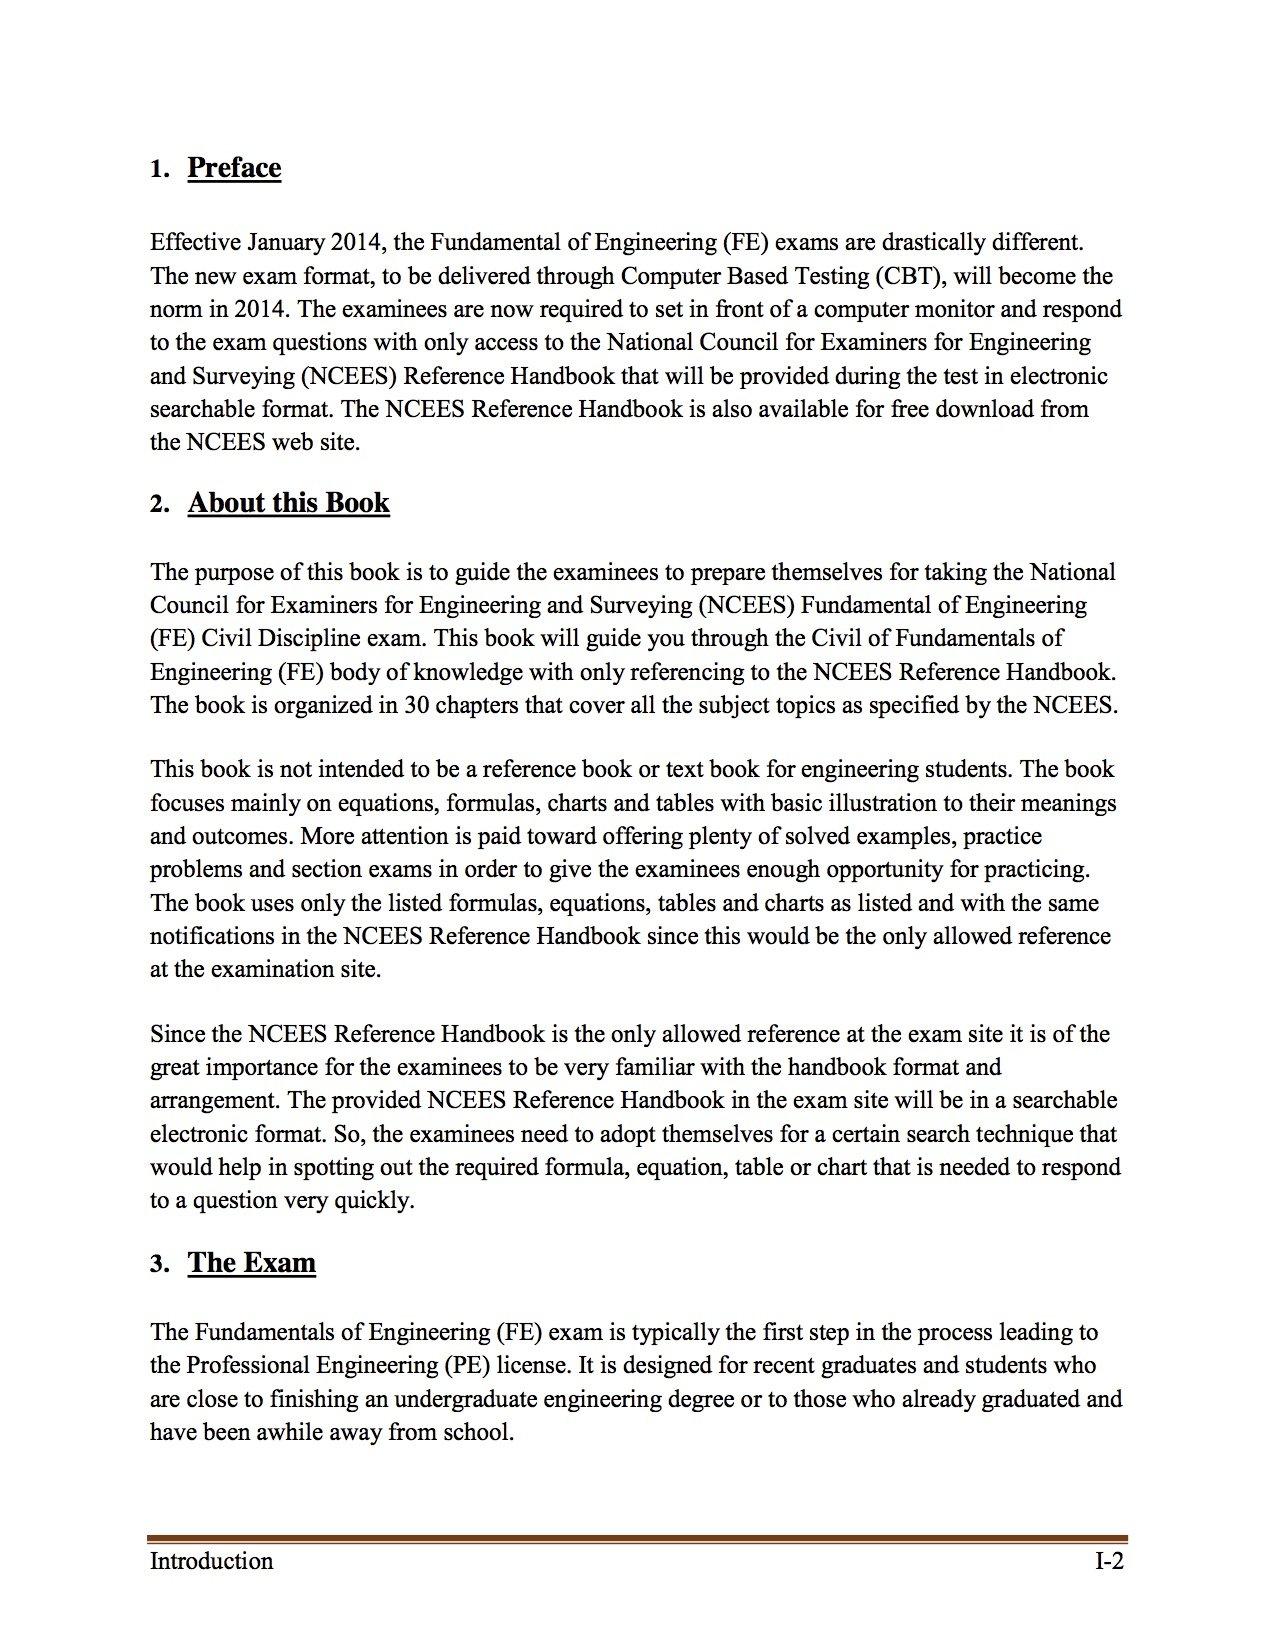 Fundamentals of Engineering (Civil) - Exam Preparation Guide: M.Sc, P.E.  Sameh Hegazi: 9780985697266: Amazon.com: Books